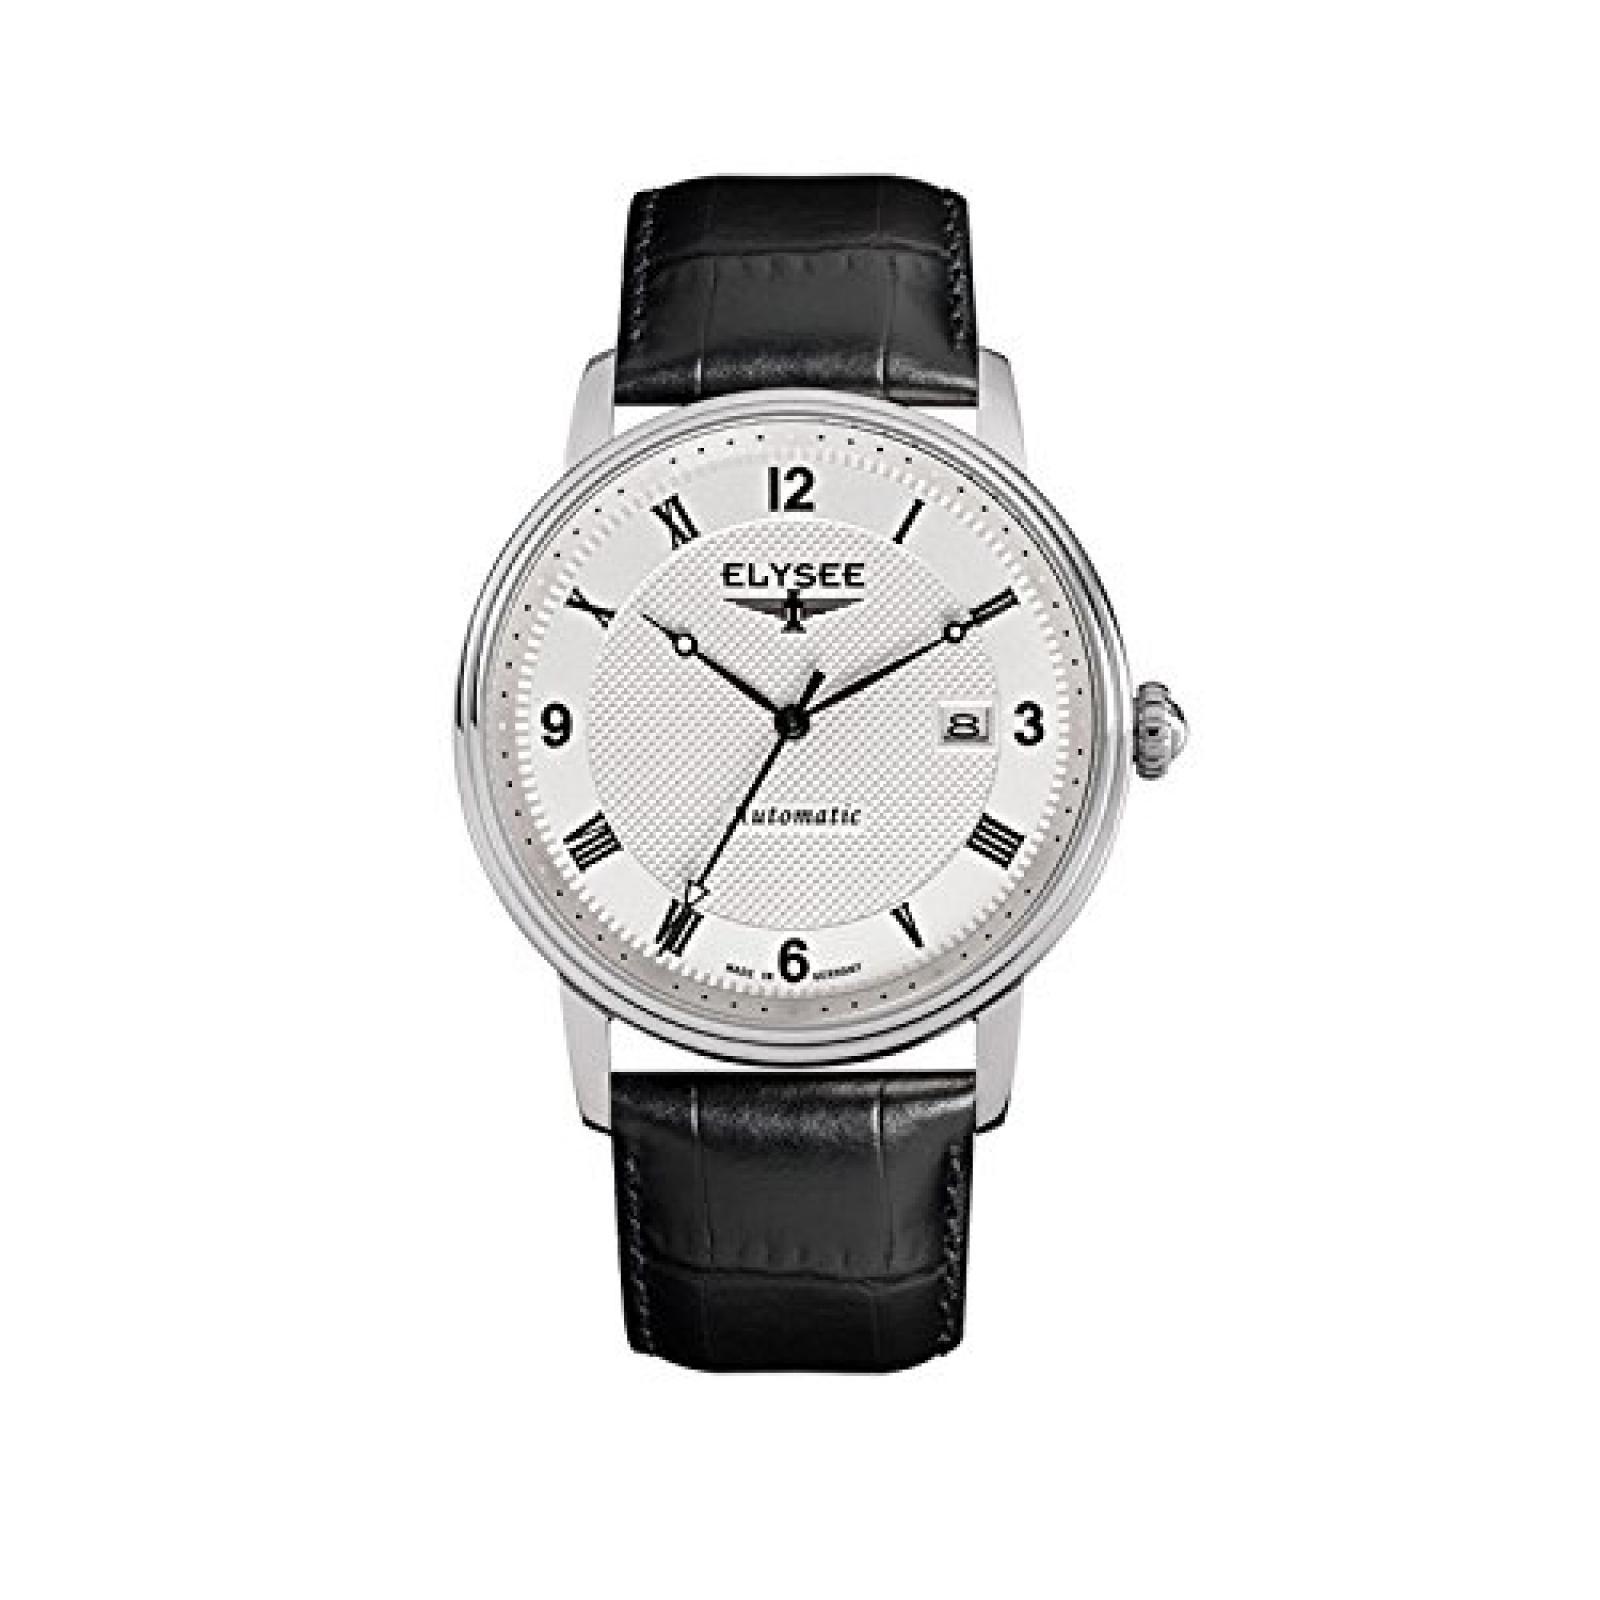 Elysee Herren Uhr Monumentum Automatic Lederband Schwarz